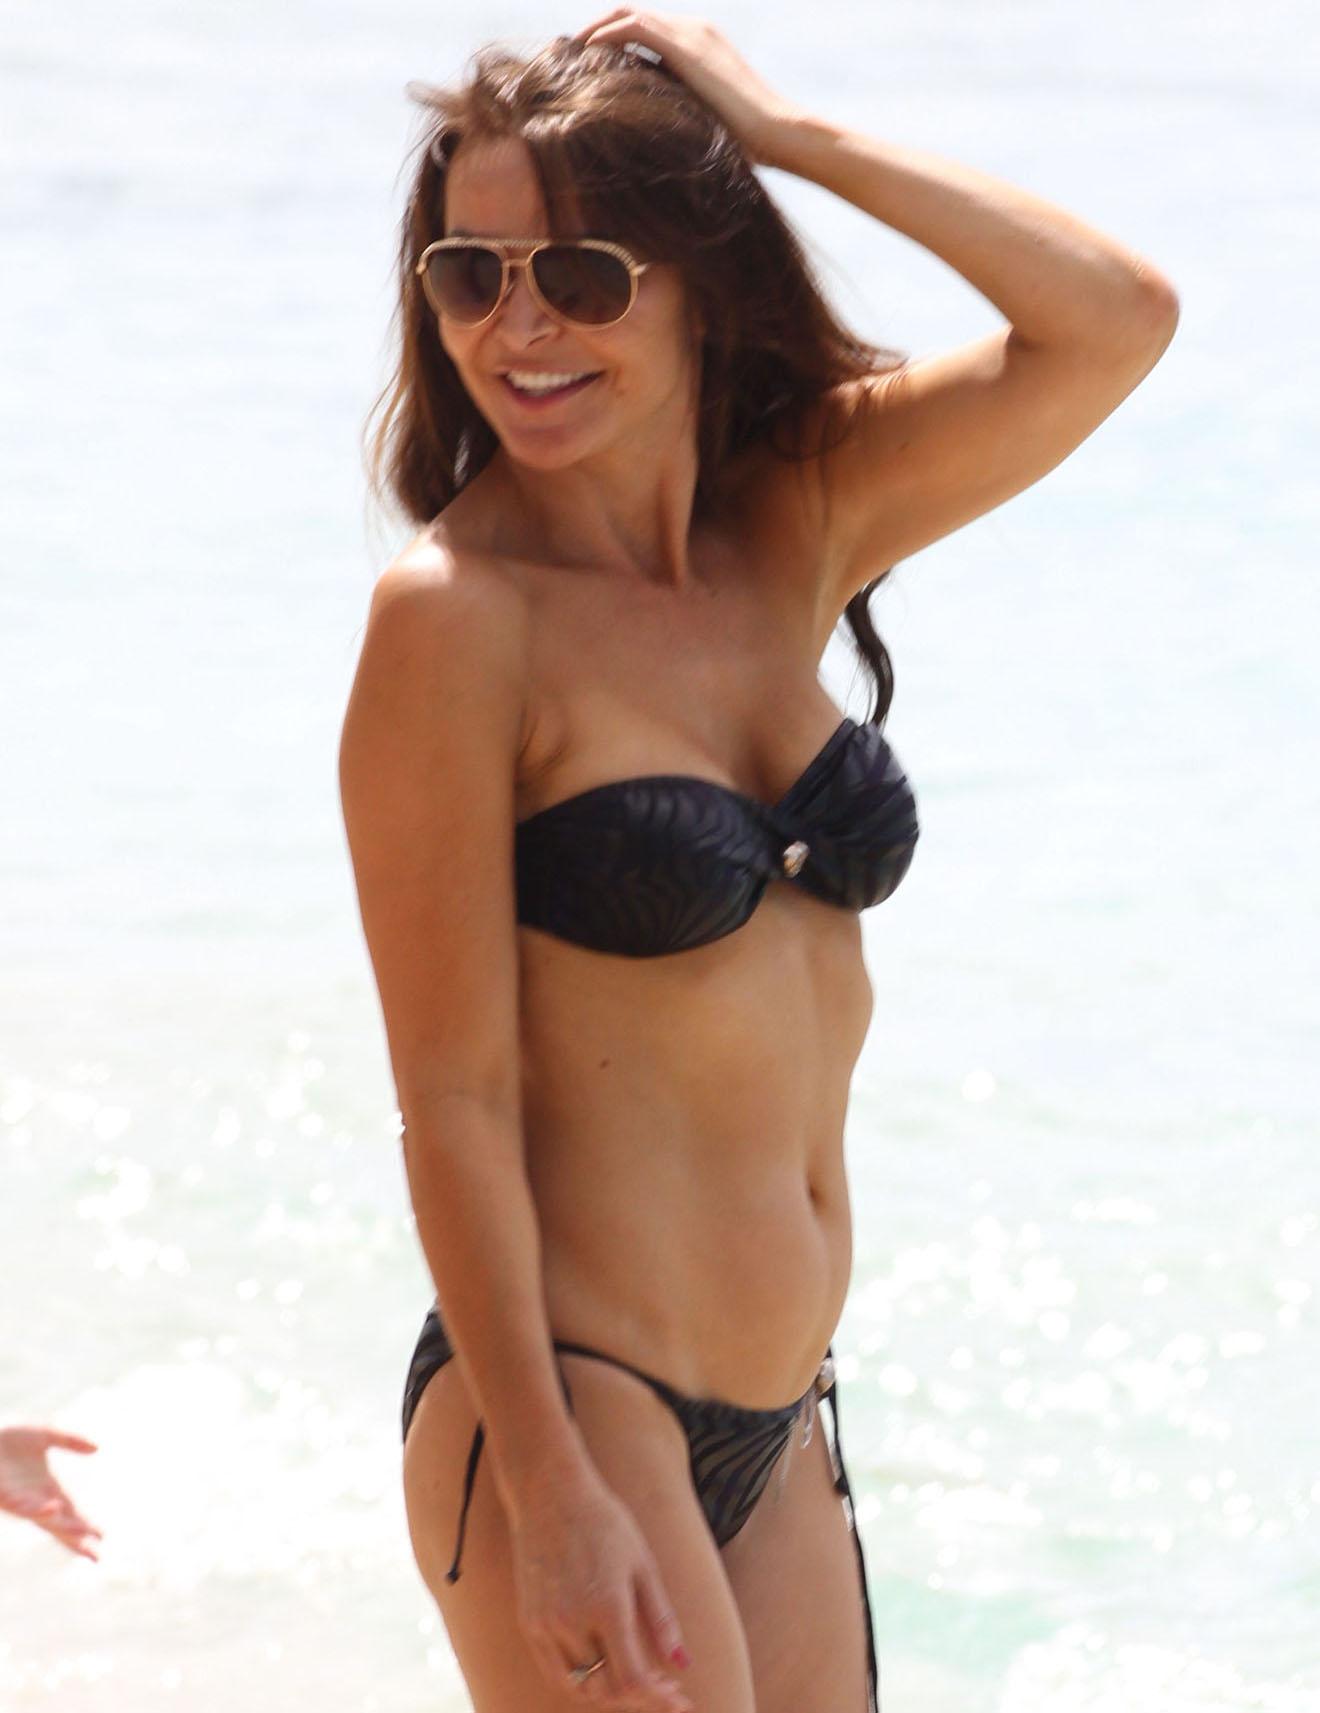 Video Jessica Sutta nudes (63 photos), Hot